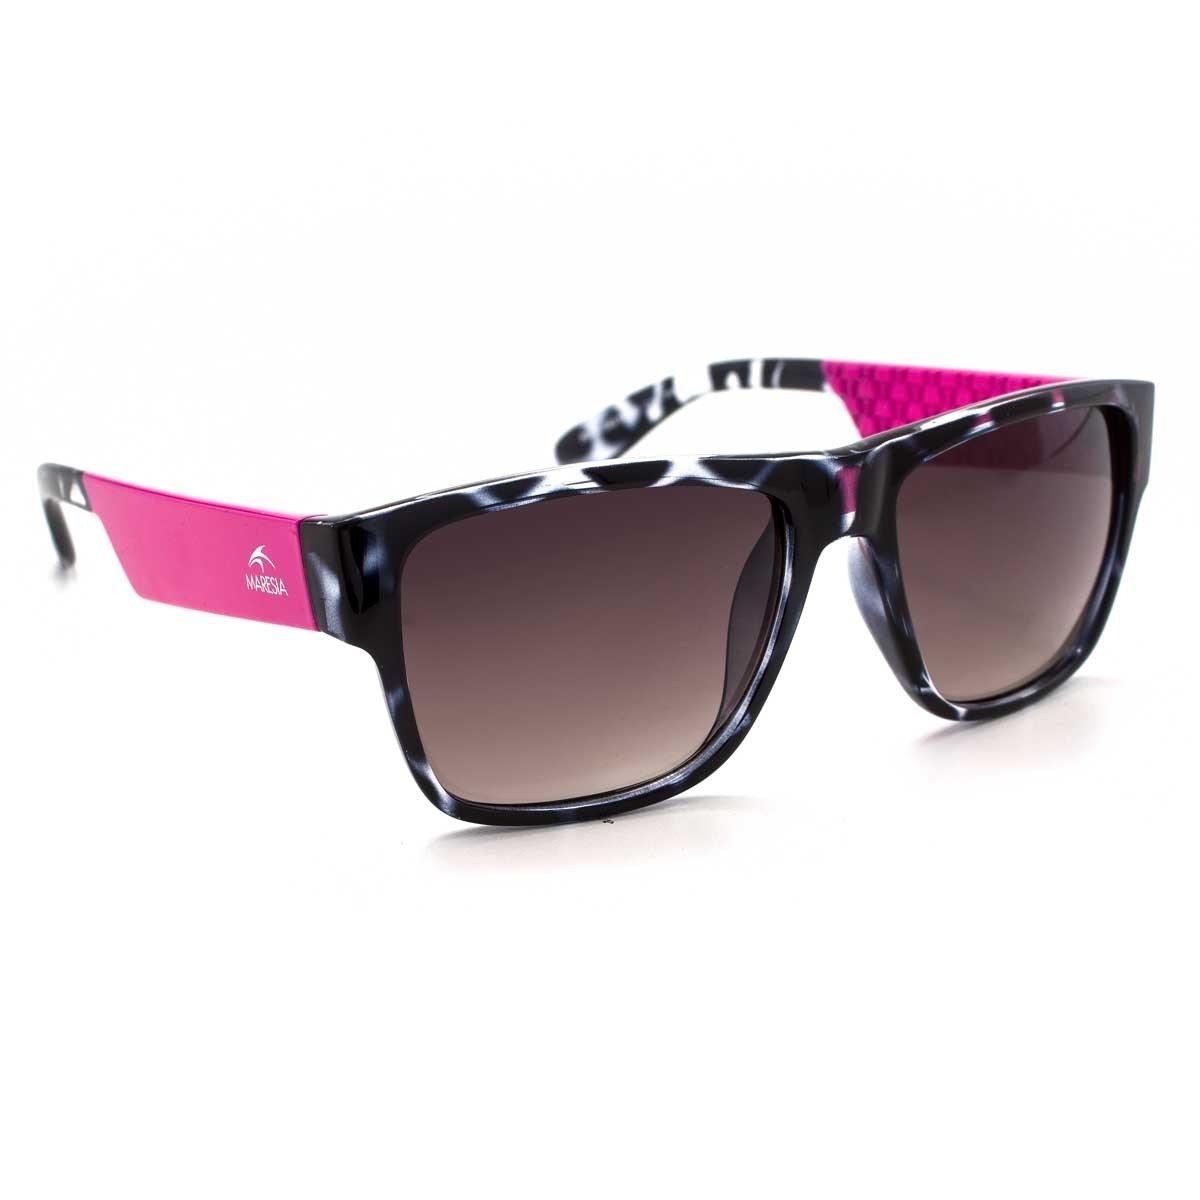 aa4f06066b426 Óculos de sol Porto das Dunas Maresia - Compre Agora   Netshoes